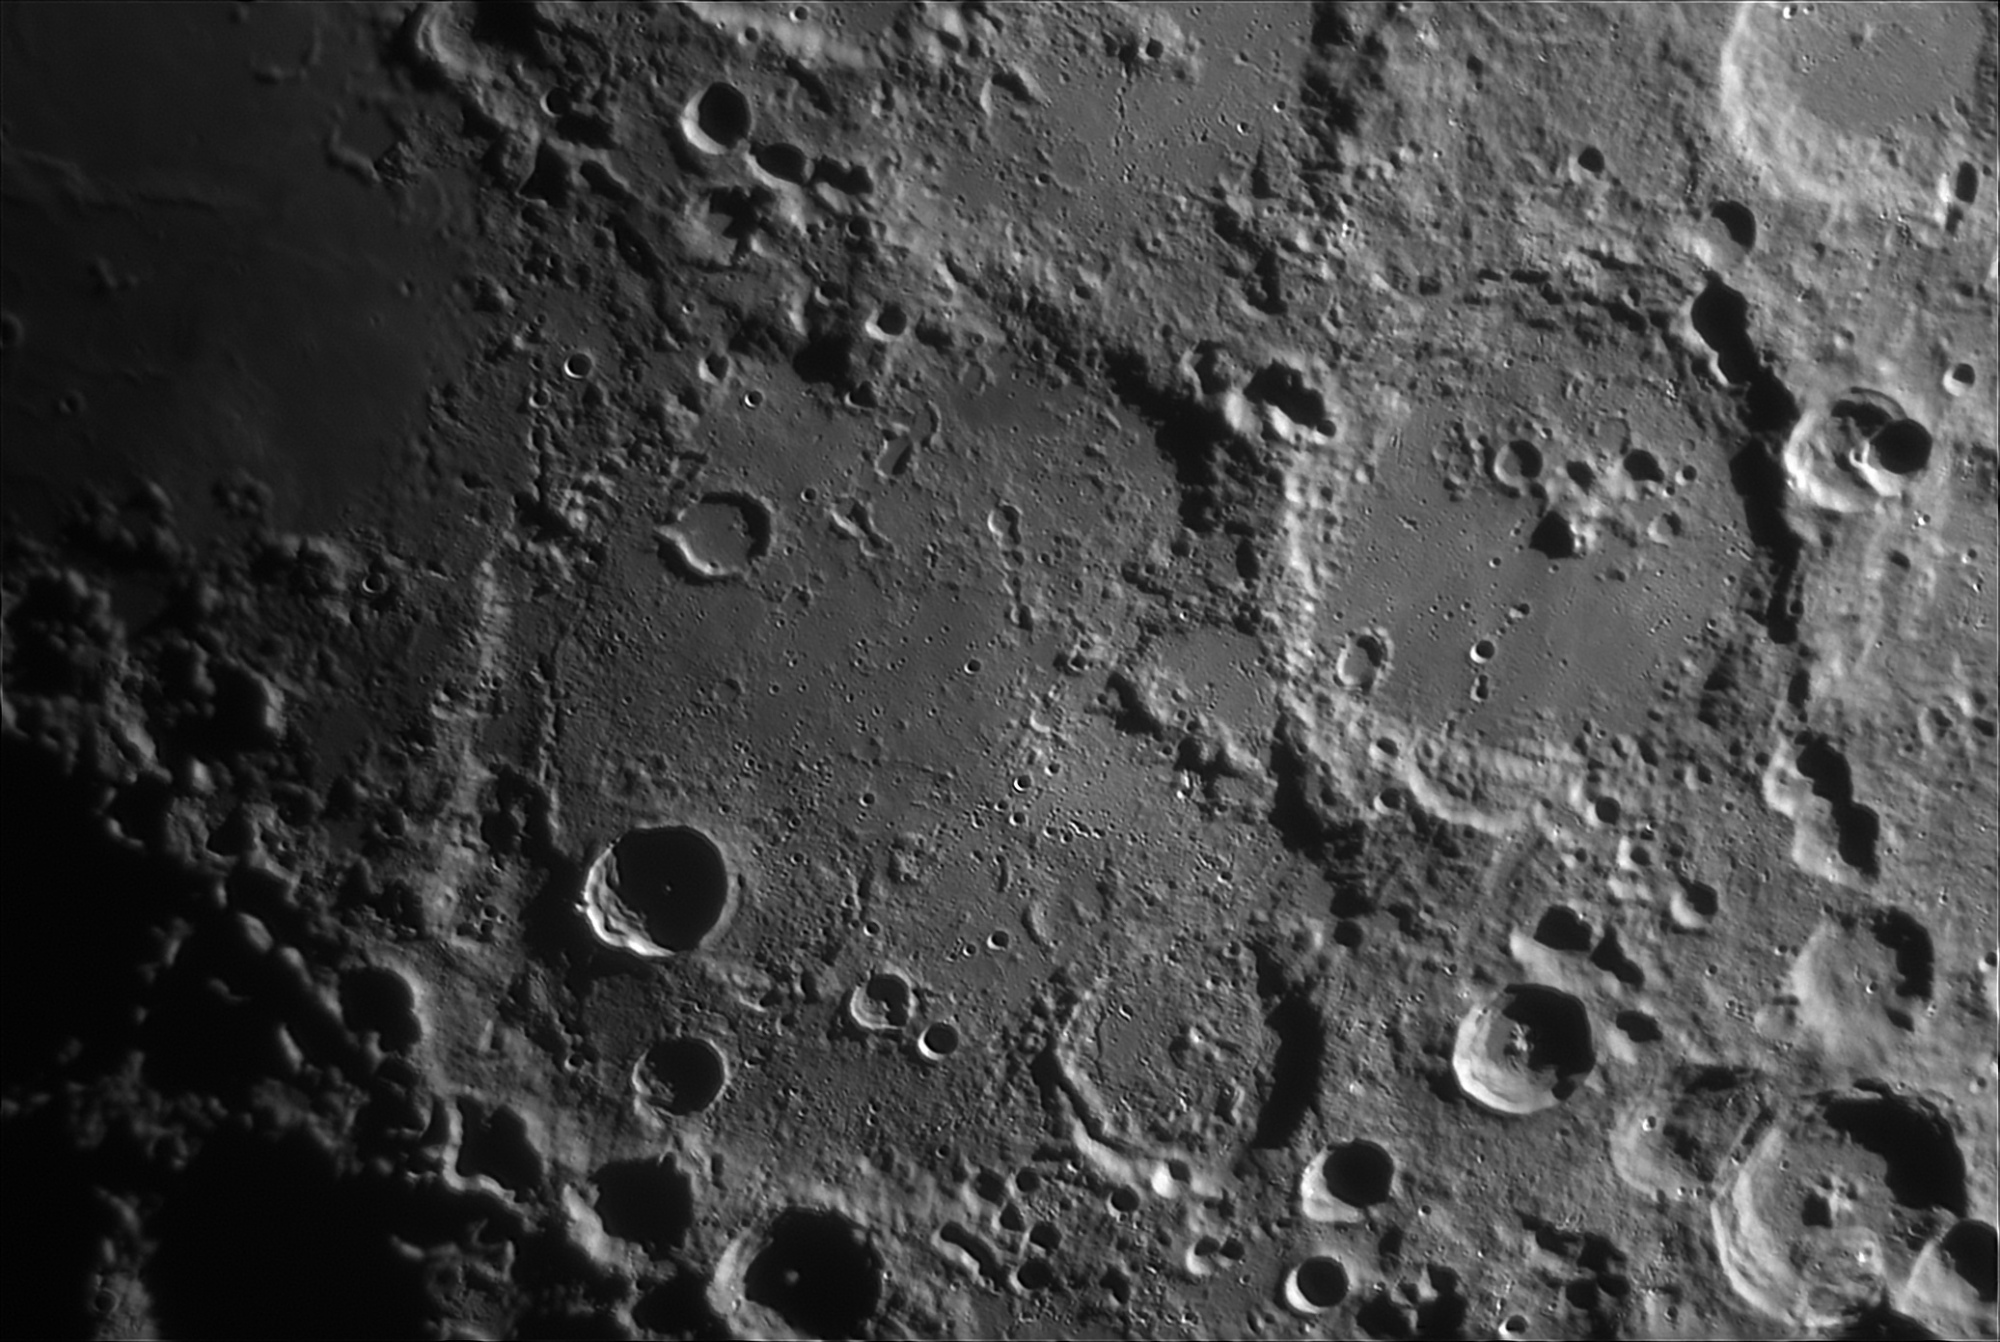 Moon_200530_204855_G_Maginus.thumb.jpg.513f4fa4c5acc3dc1f60f94865ebfb9a.jpg